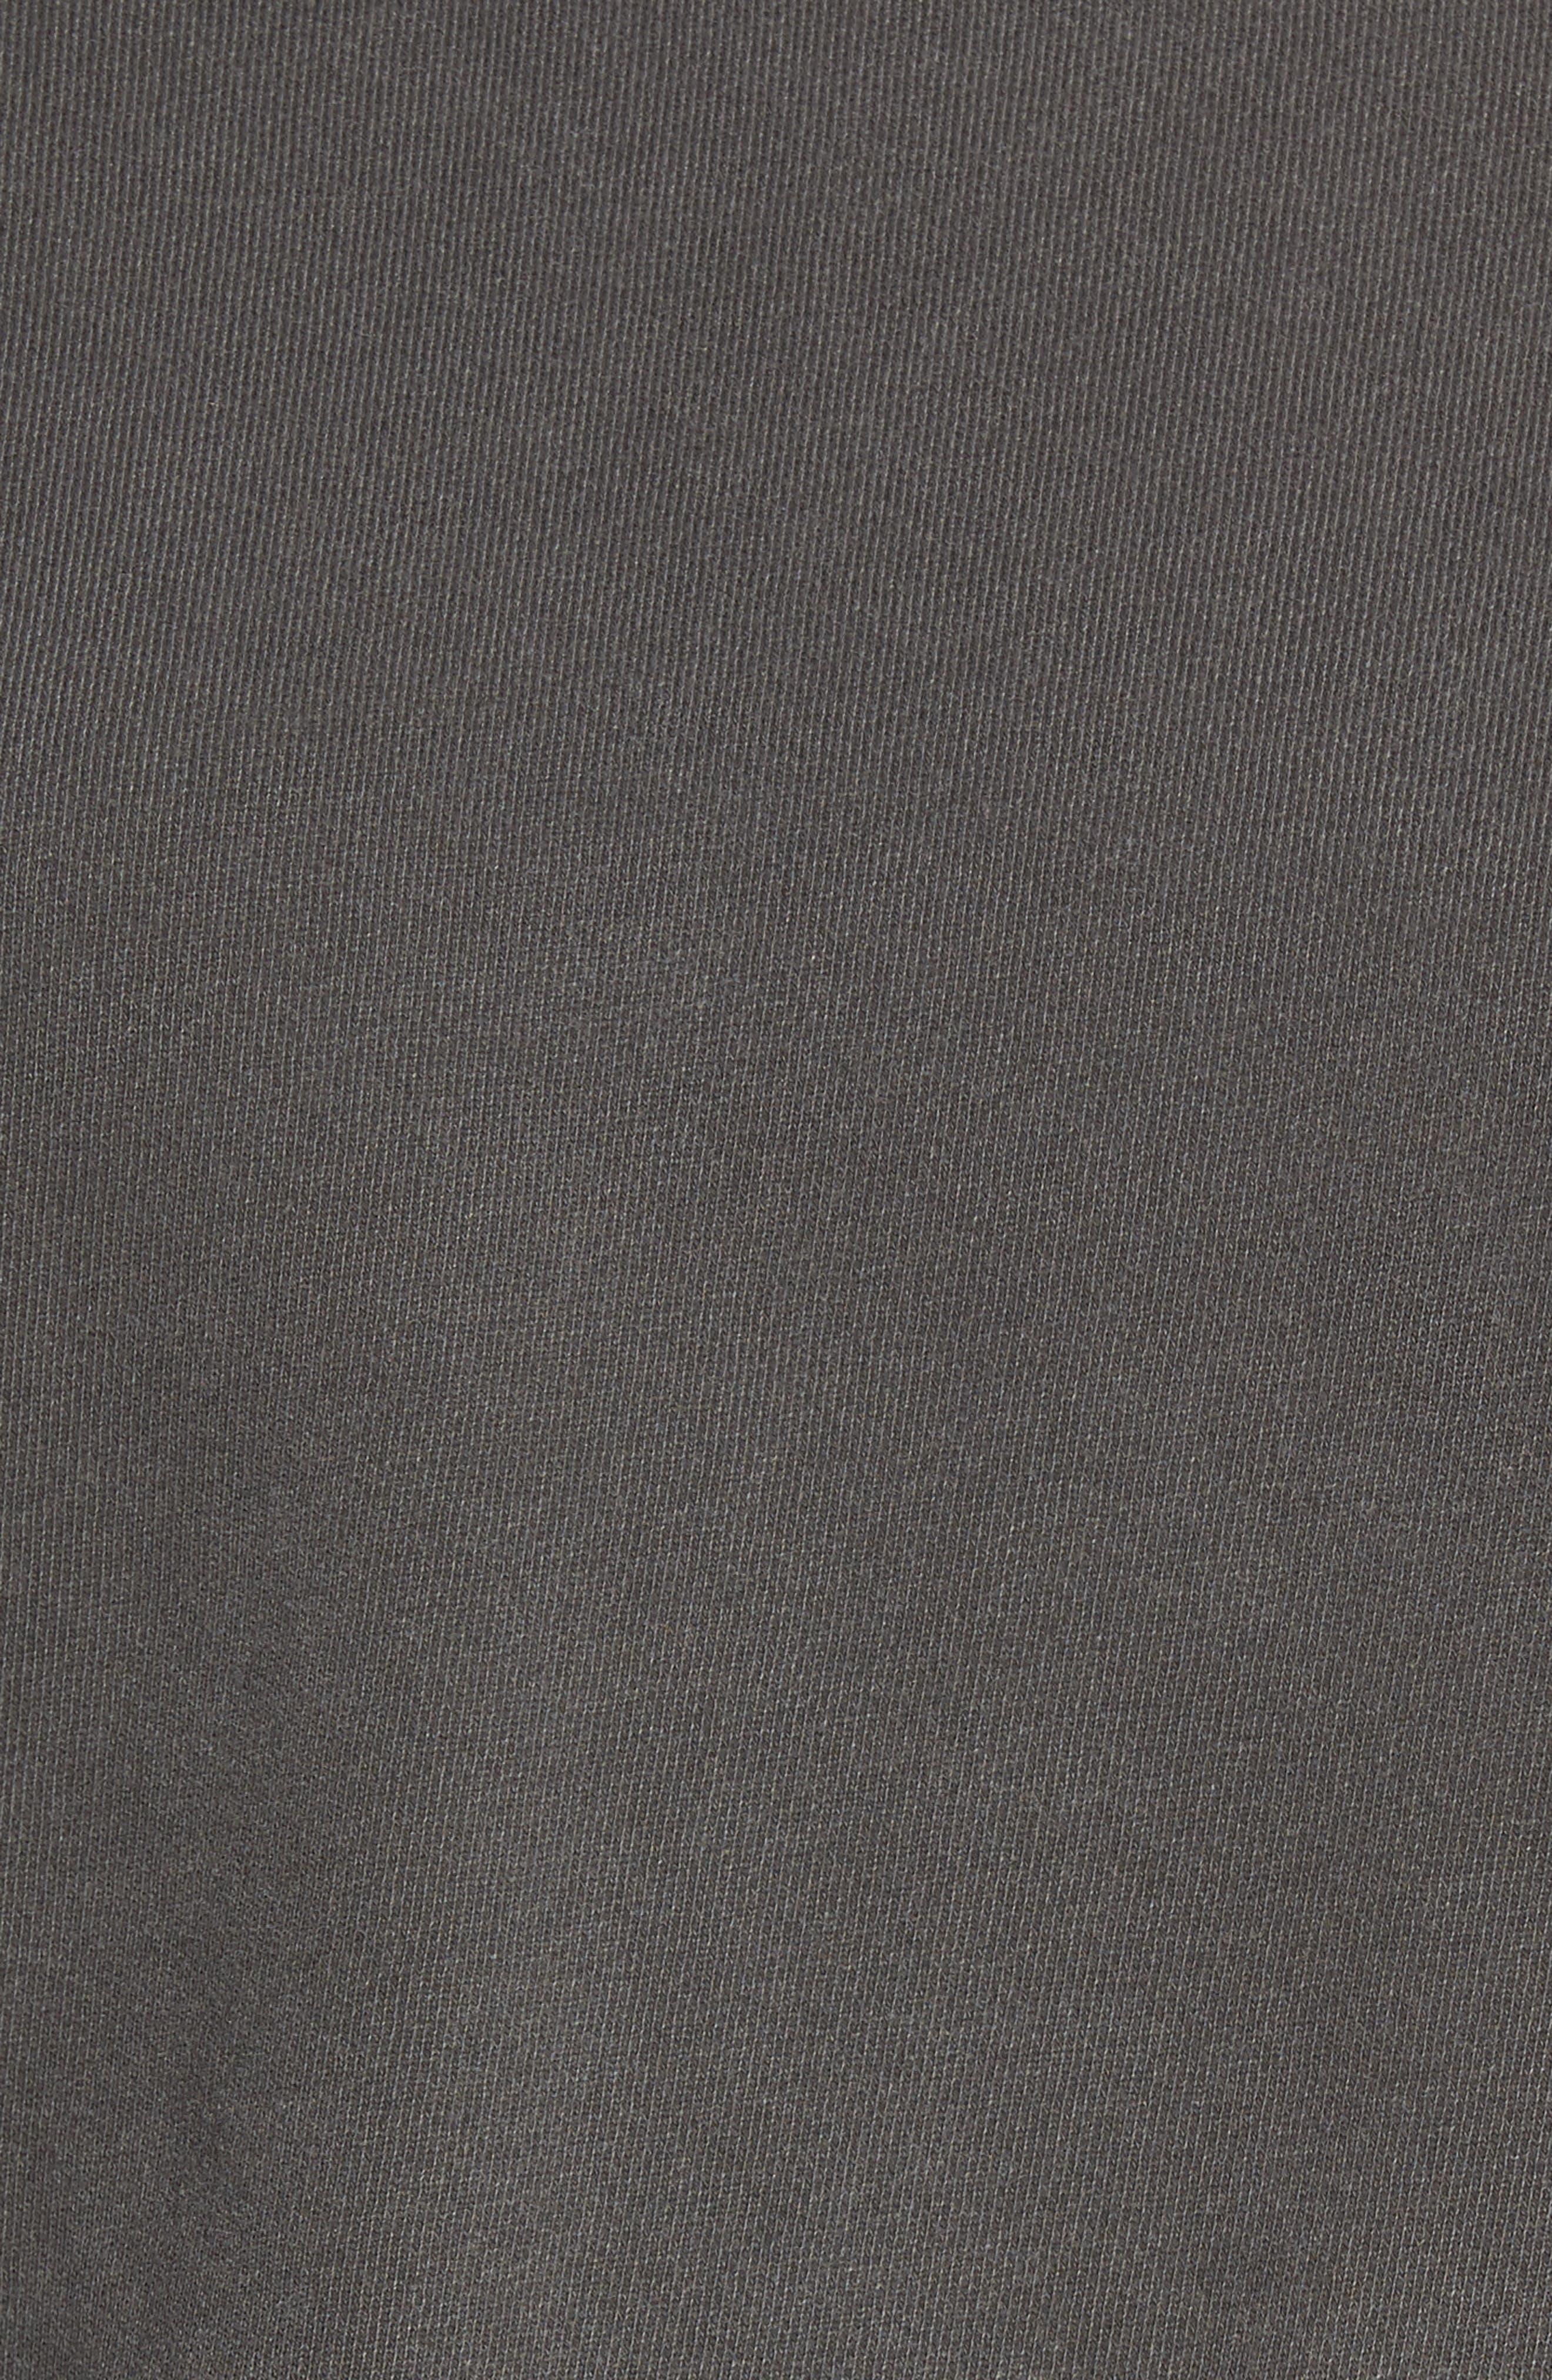 Diana Distressed Sweatshirt,                             Alternate thumbnail 5, color,                             012